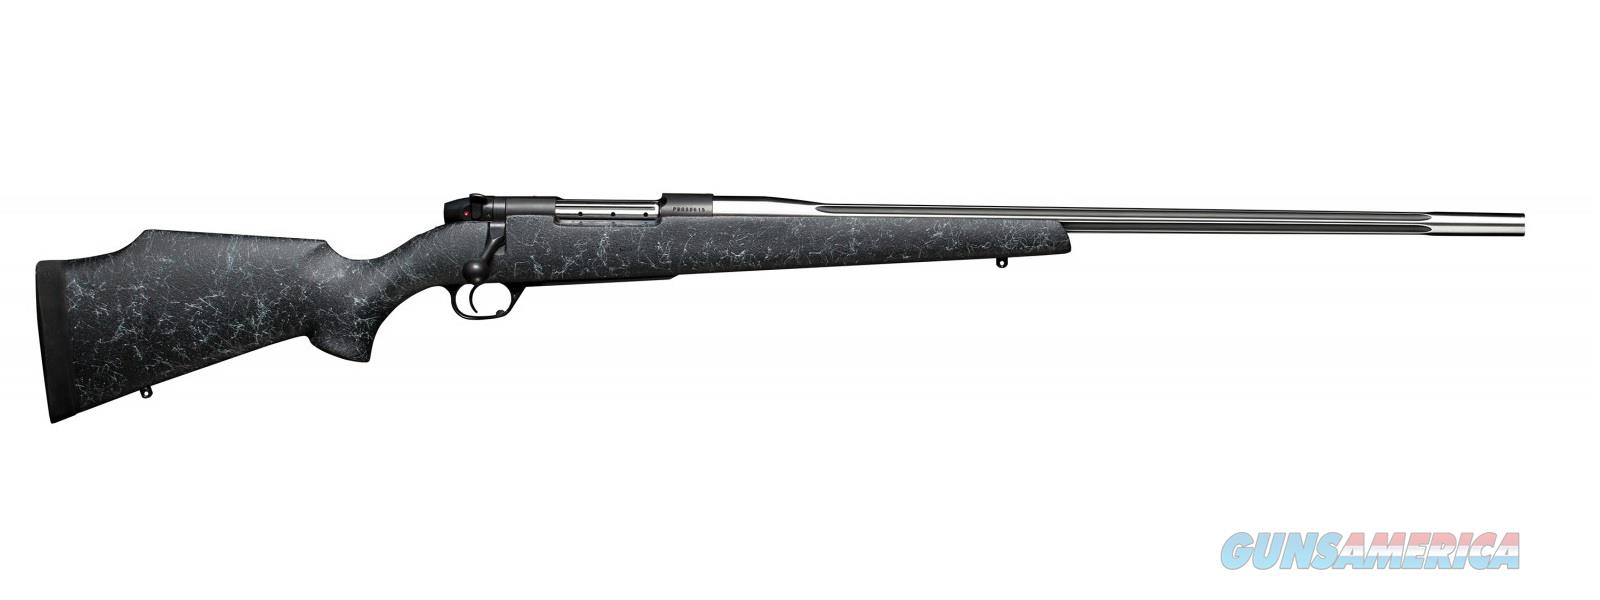 "Weatherby Mark V Accumark 24"" 6.5 Creedmoor MAMS65CMR4O  Guns > Rifles > Weatherby Rifles > Sporting"